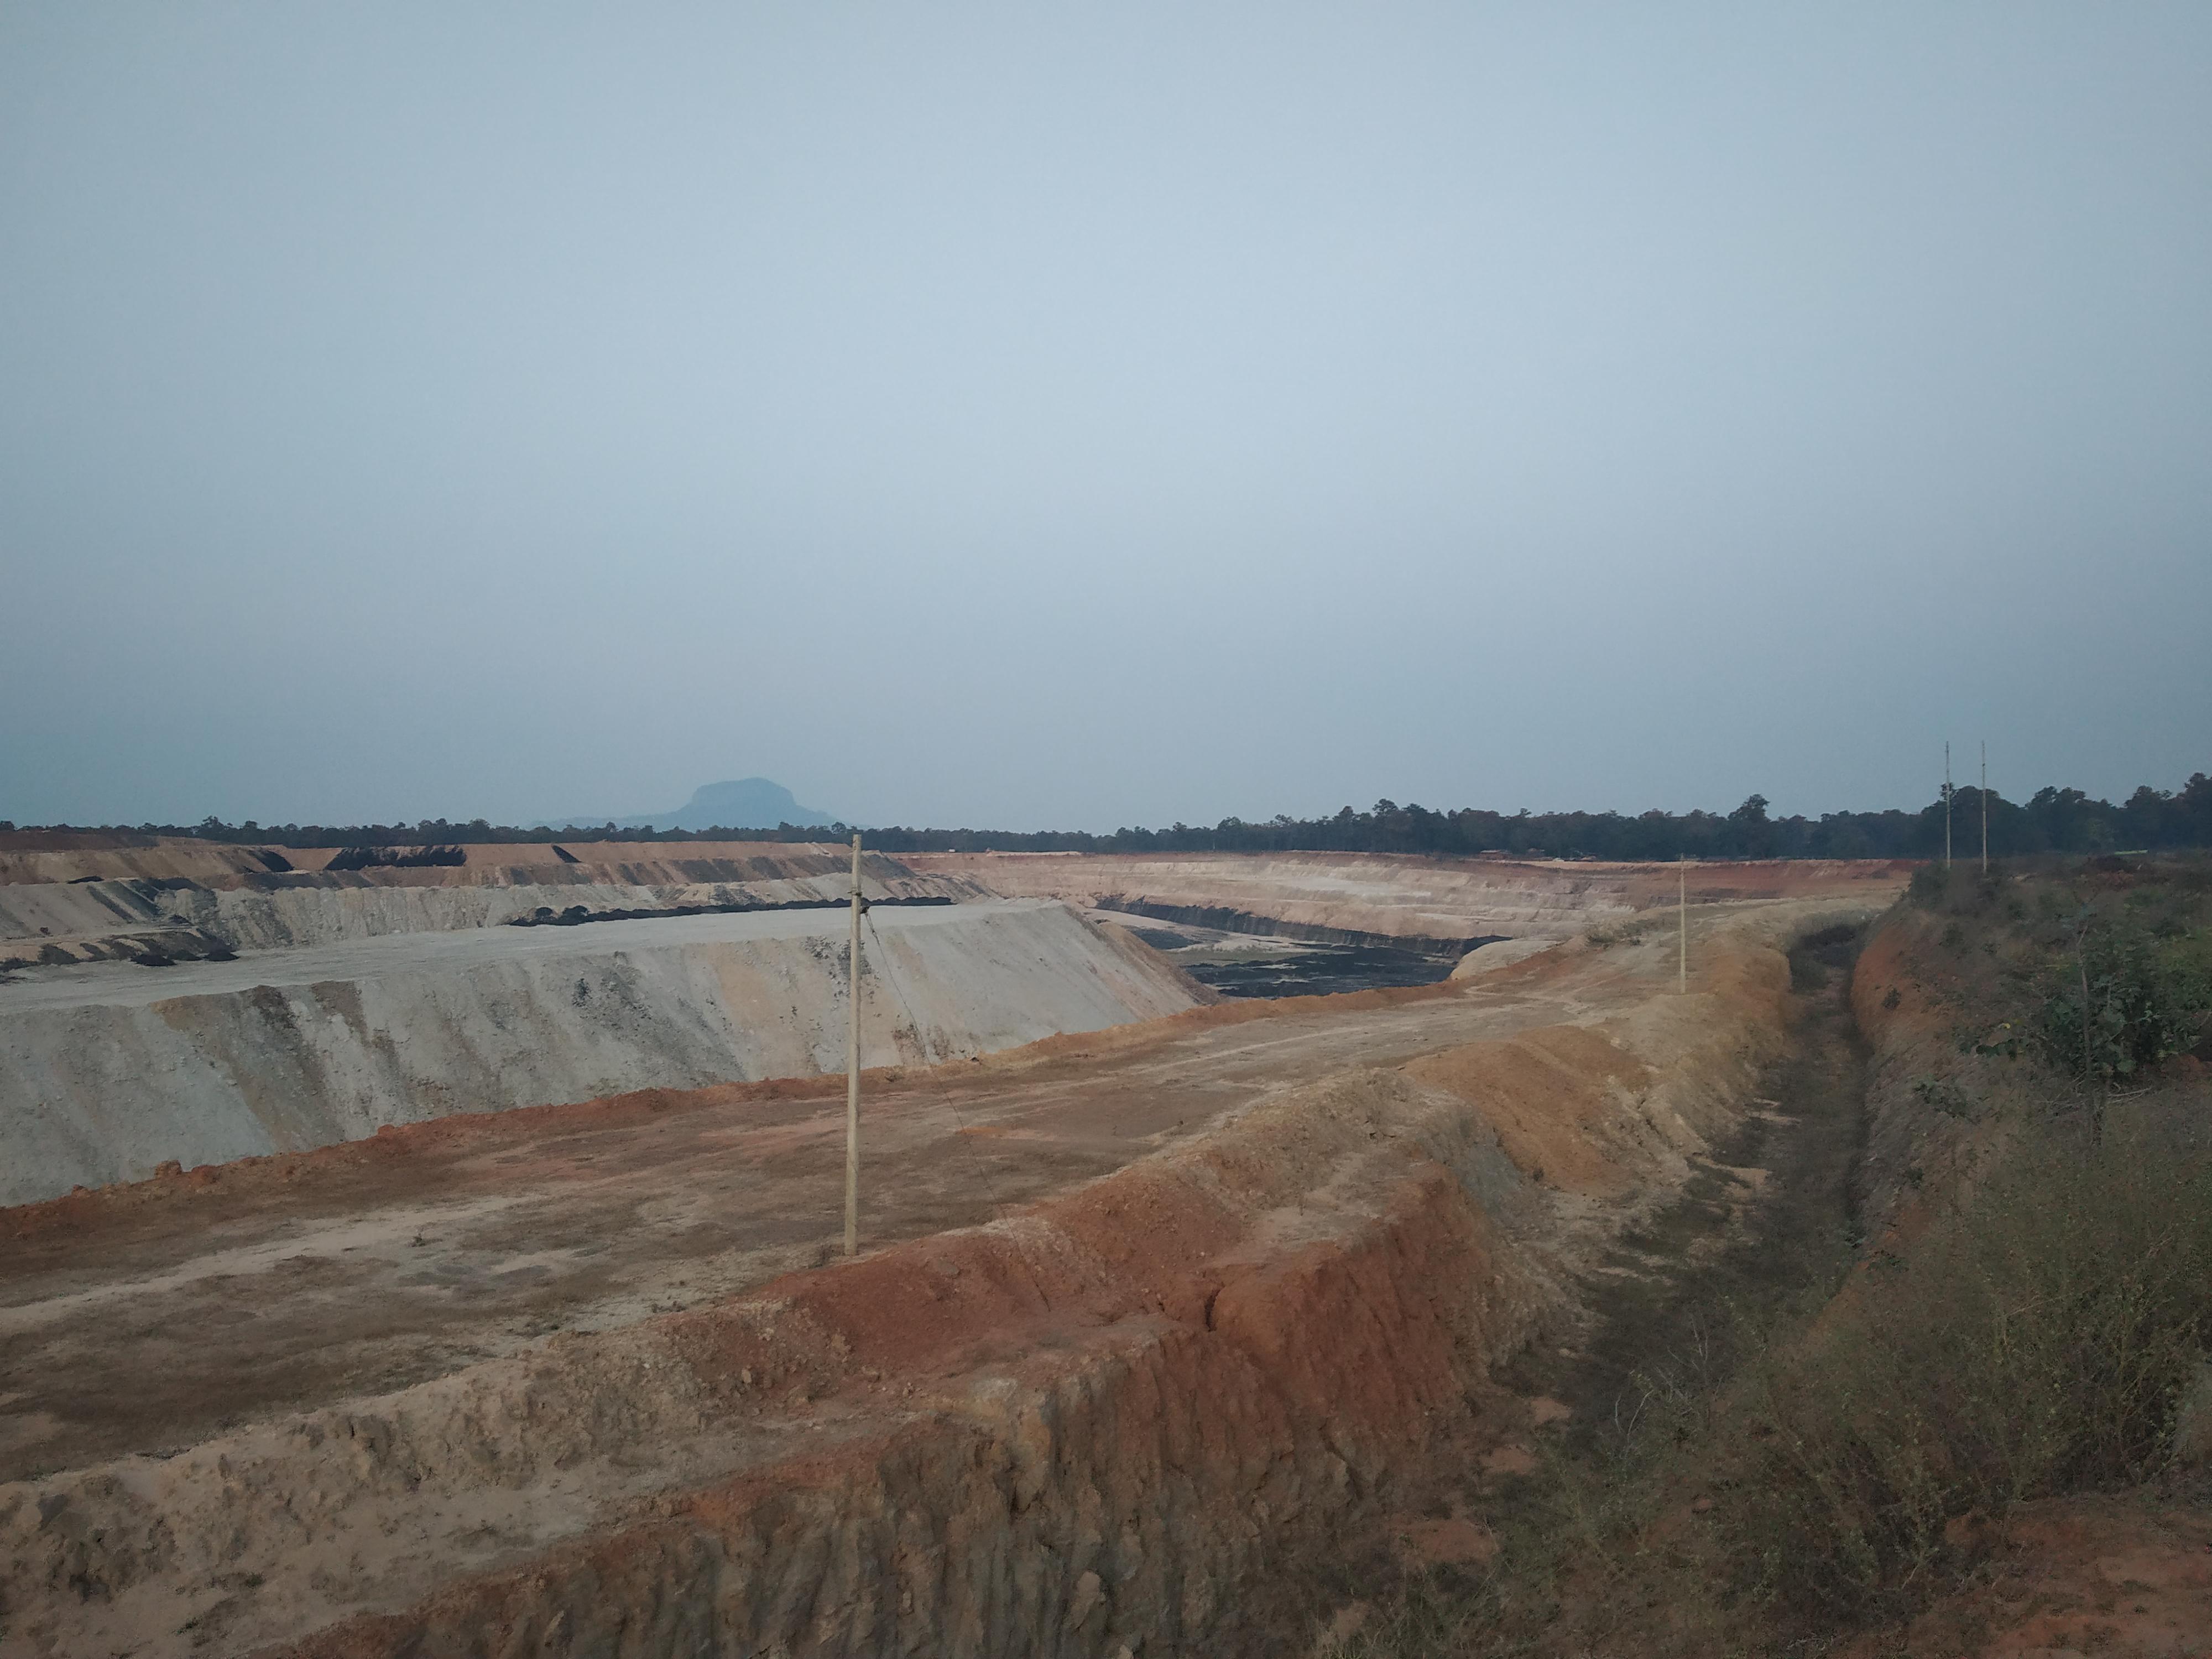 Parsa East & Kente Basan coal mine, Chhattisgarh, India. Photo Abir Dasgupta